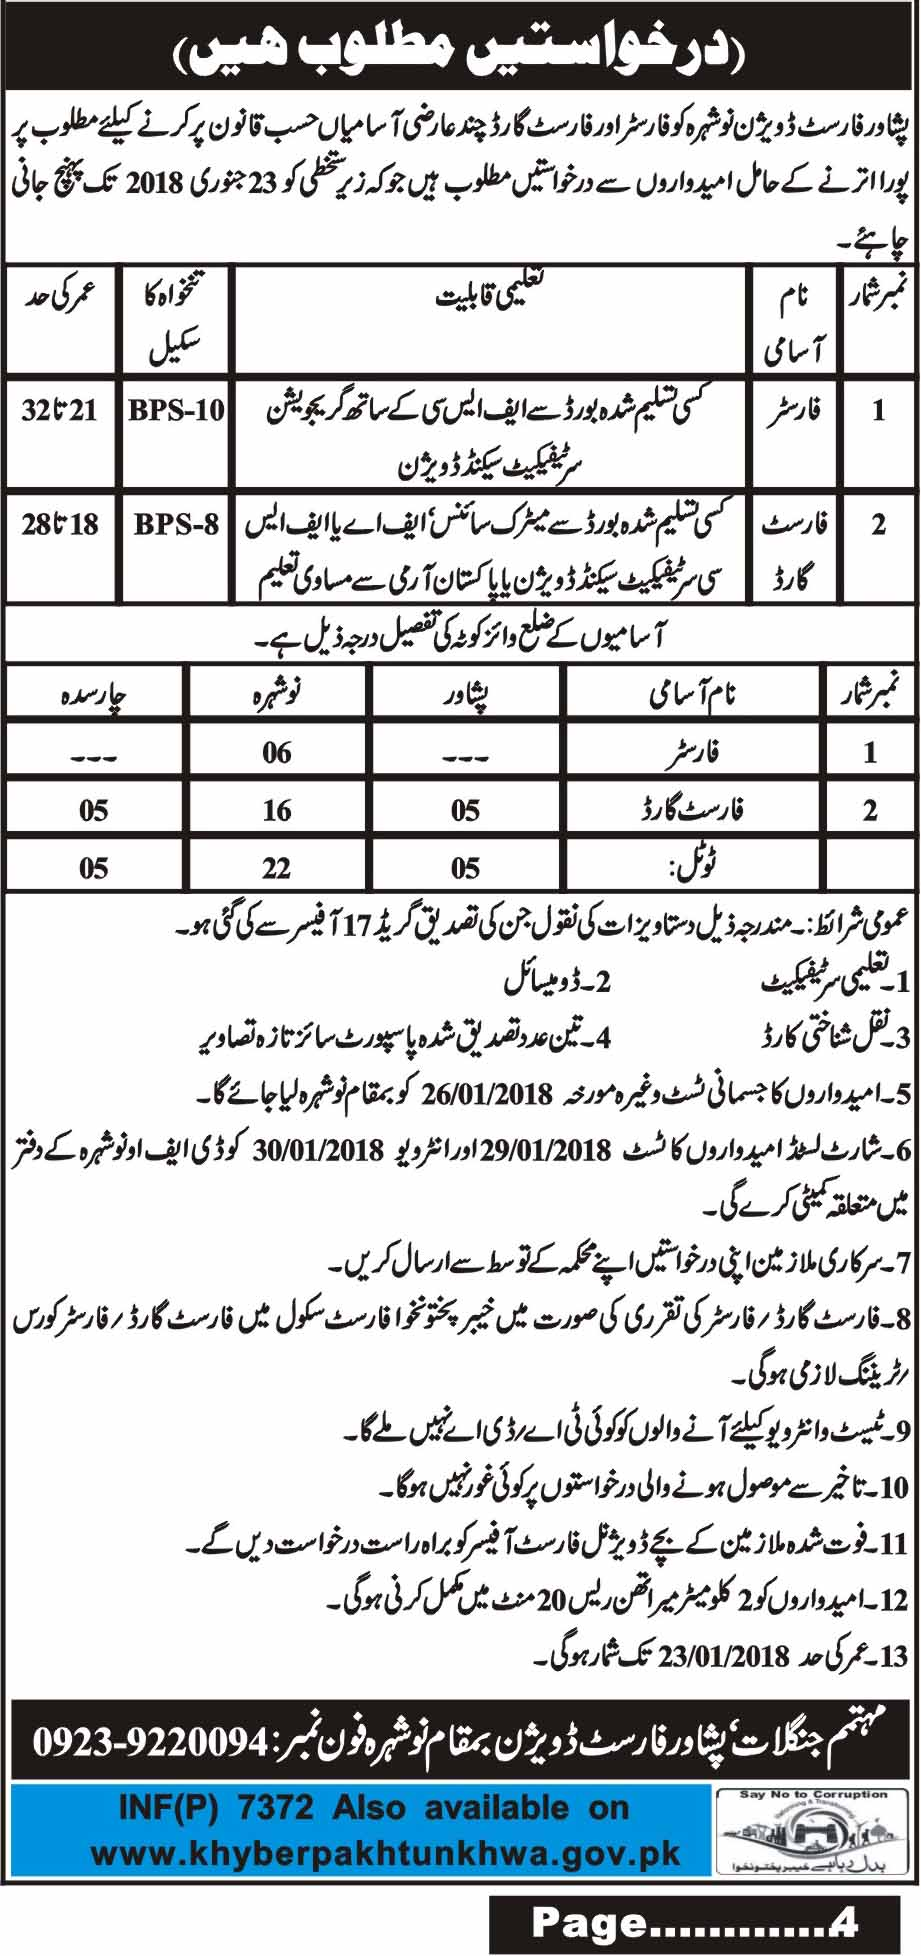 Noshehra, Pehsawar Forest Division 32 Jobs, 02 January 2018, Daily Mashriq Newspaper